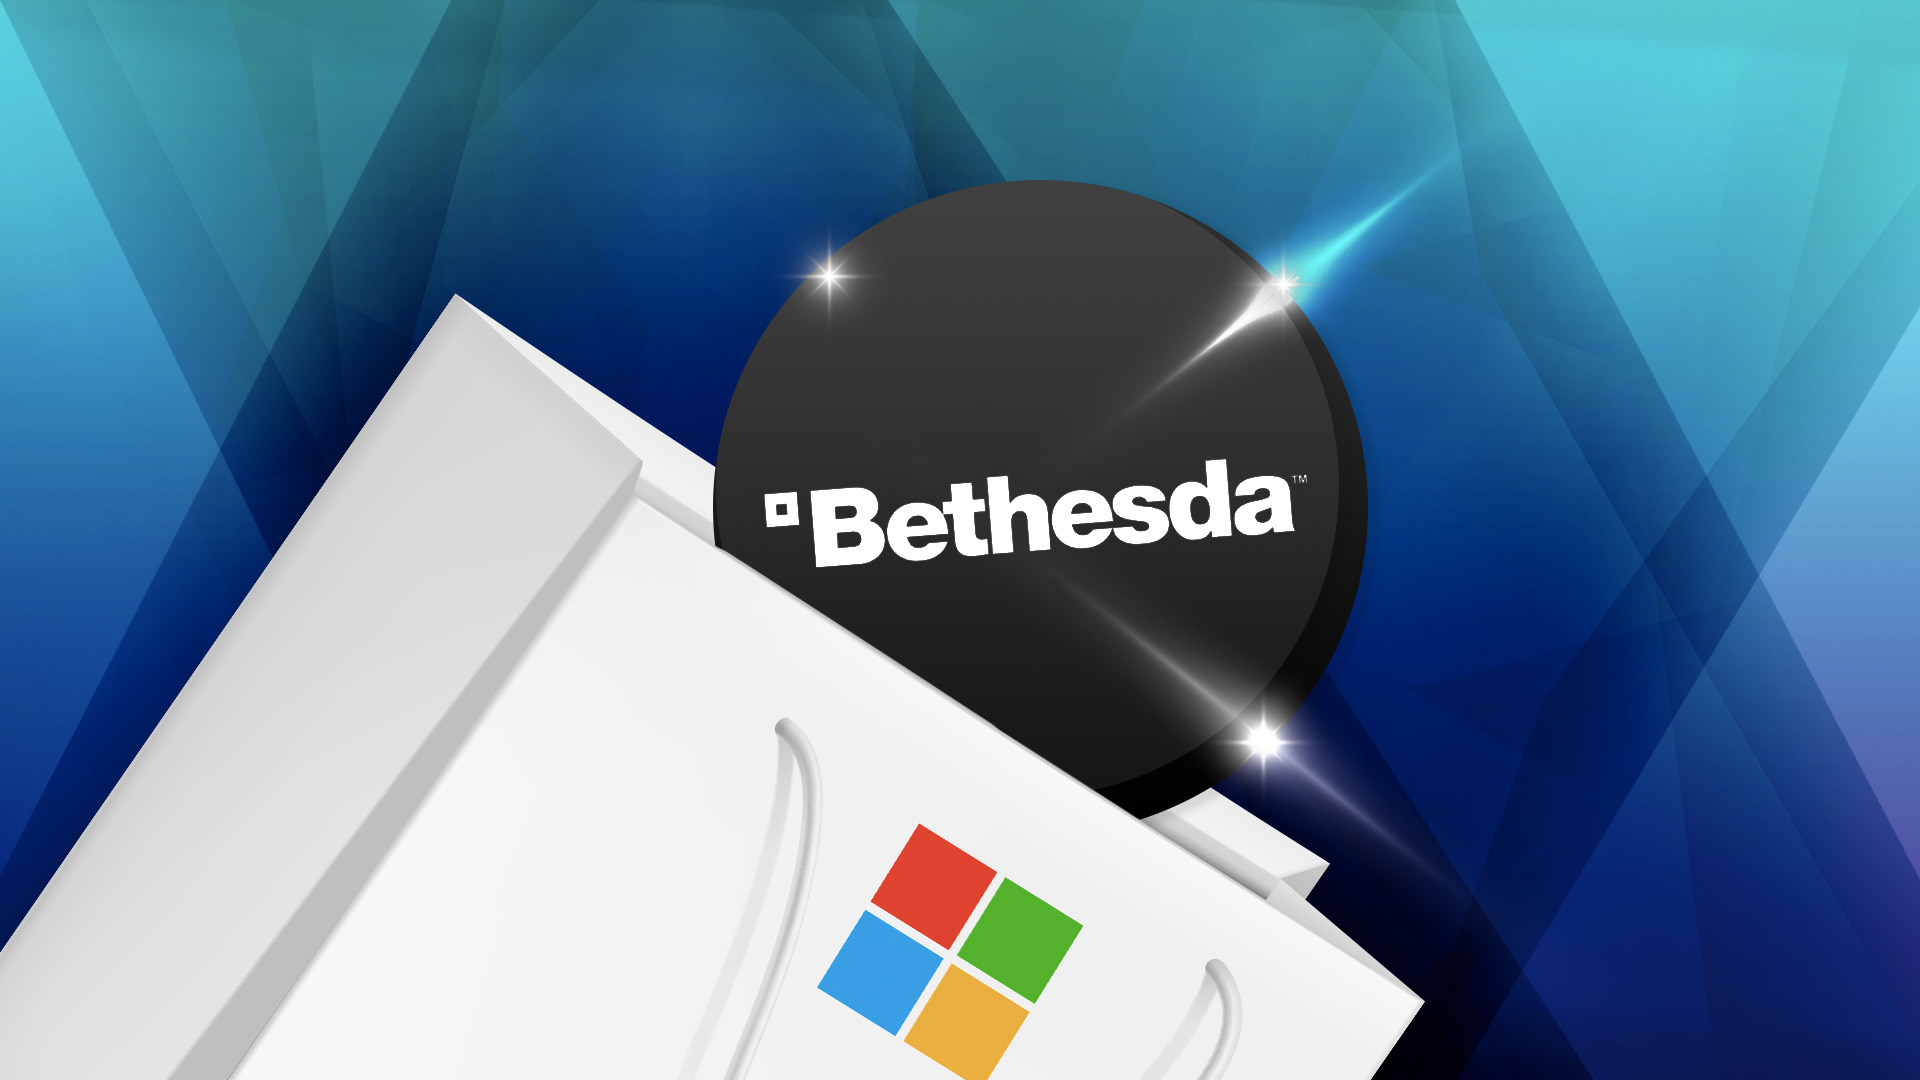 Microsoft, Microsoft Corporation, übernahme, Bethesda, Zenimax, Purchase